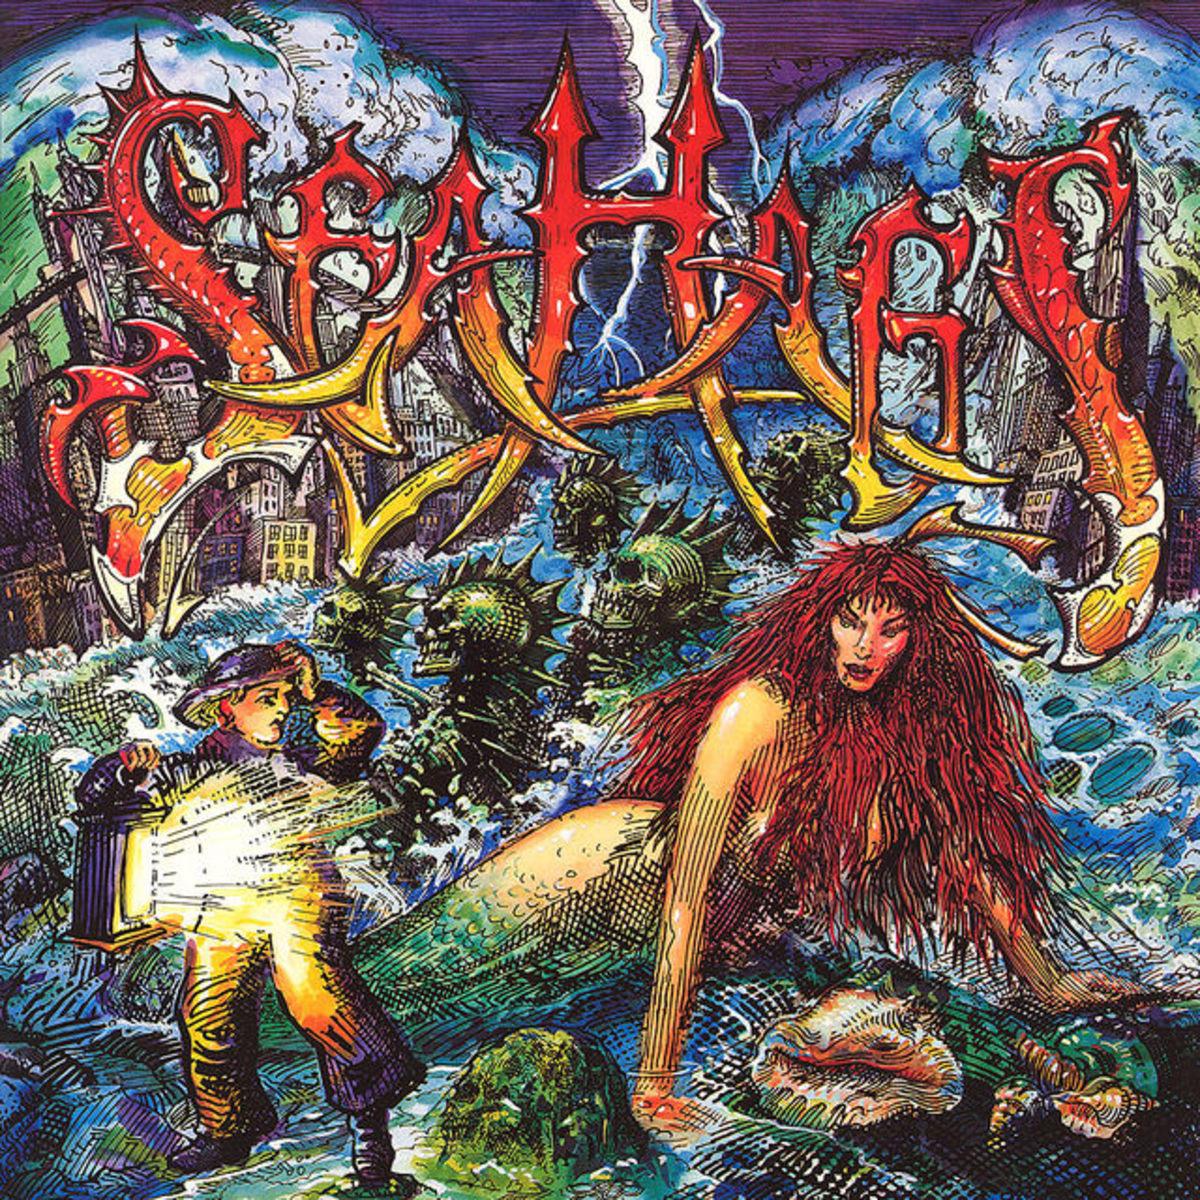 "Sea Hags ""Sea Hags"" Chrysalis FV 41665 12"" LP Vinyl Record US Pressing (1989) Album Cover Art by Rick Griffin"